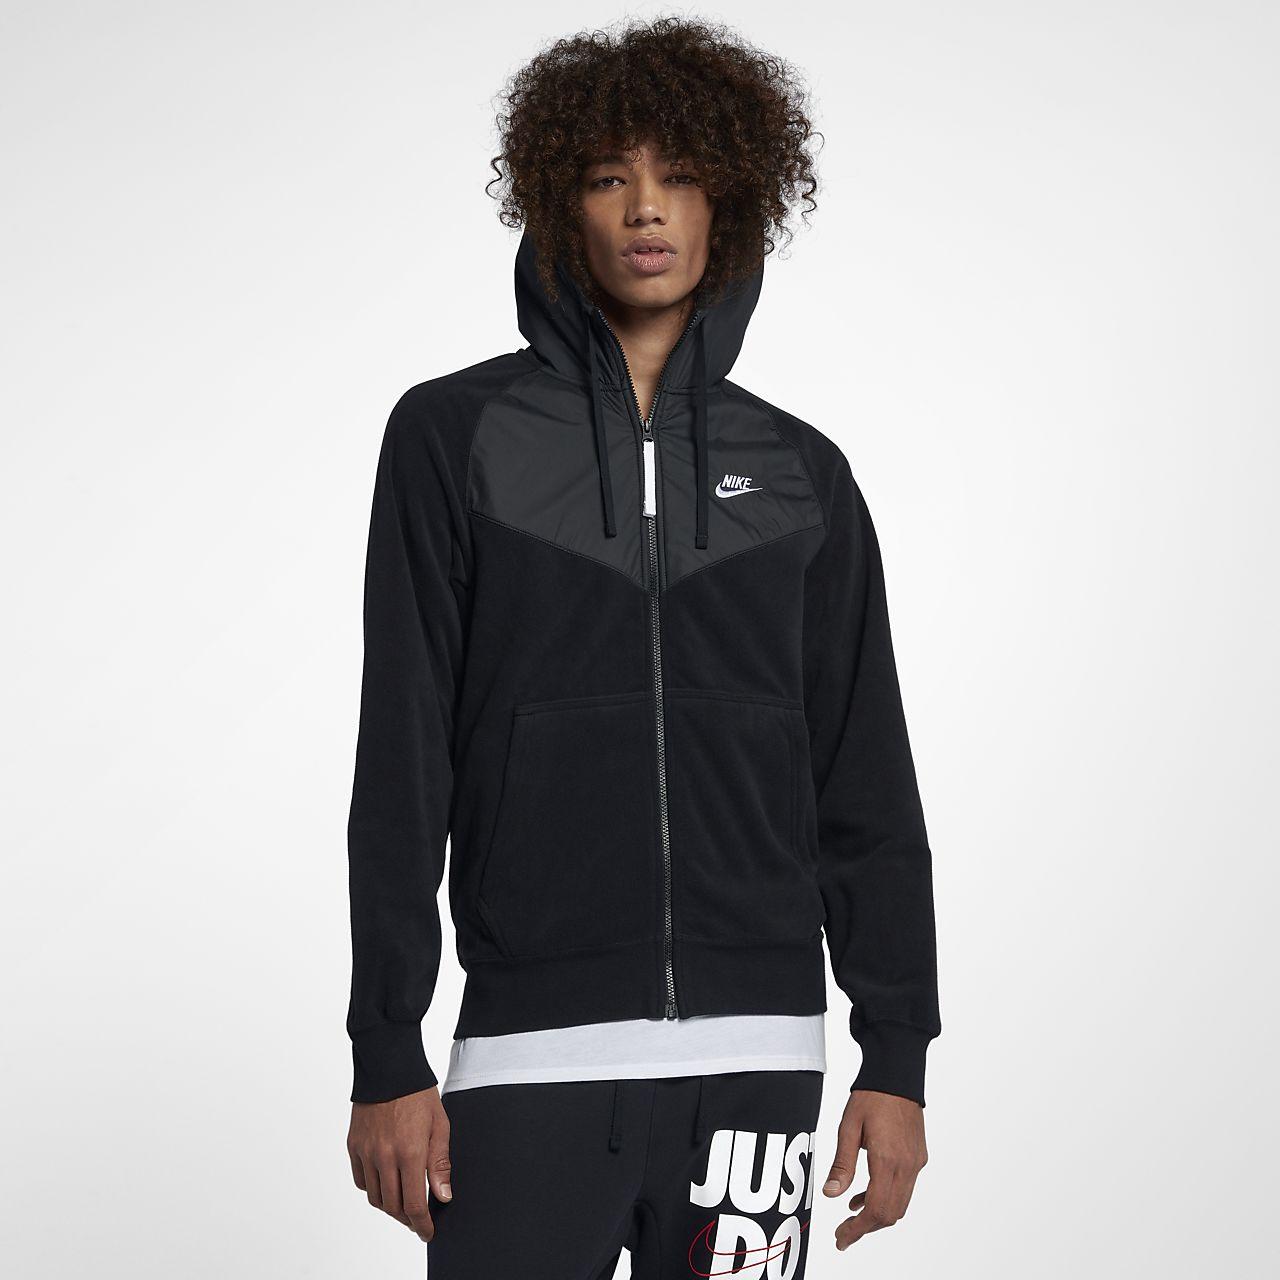 a677ba7331db Nike Sportswear Men s Full-Zip Hoodie. Nike.com CA